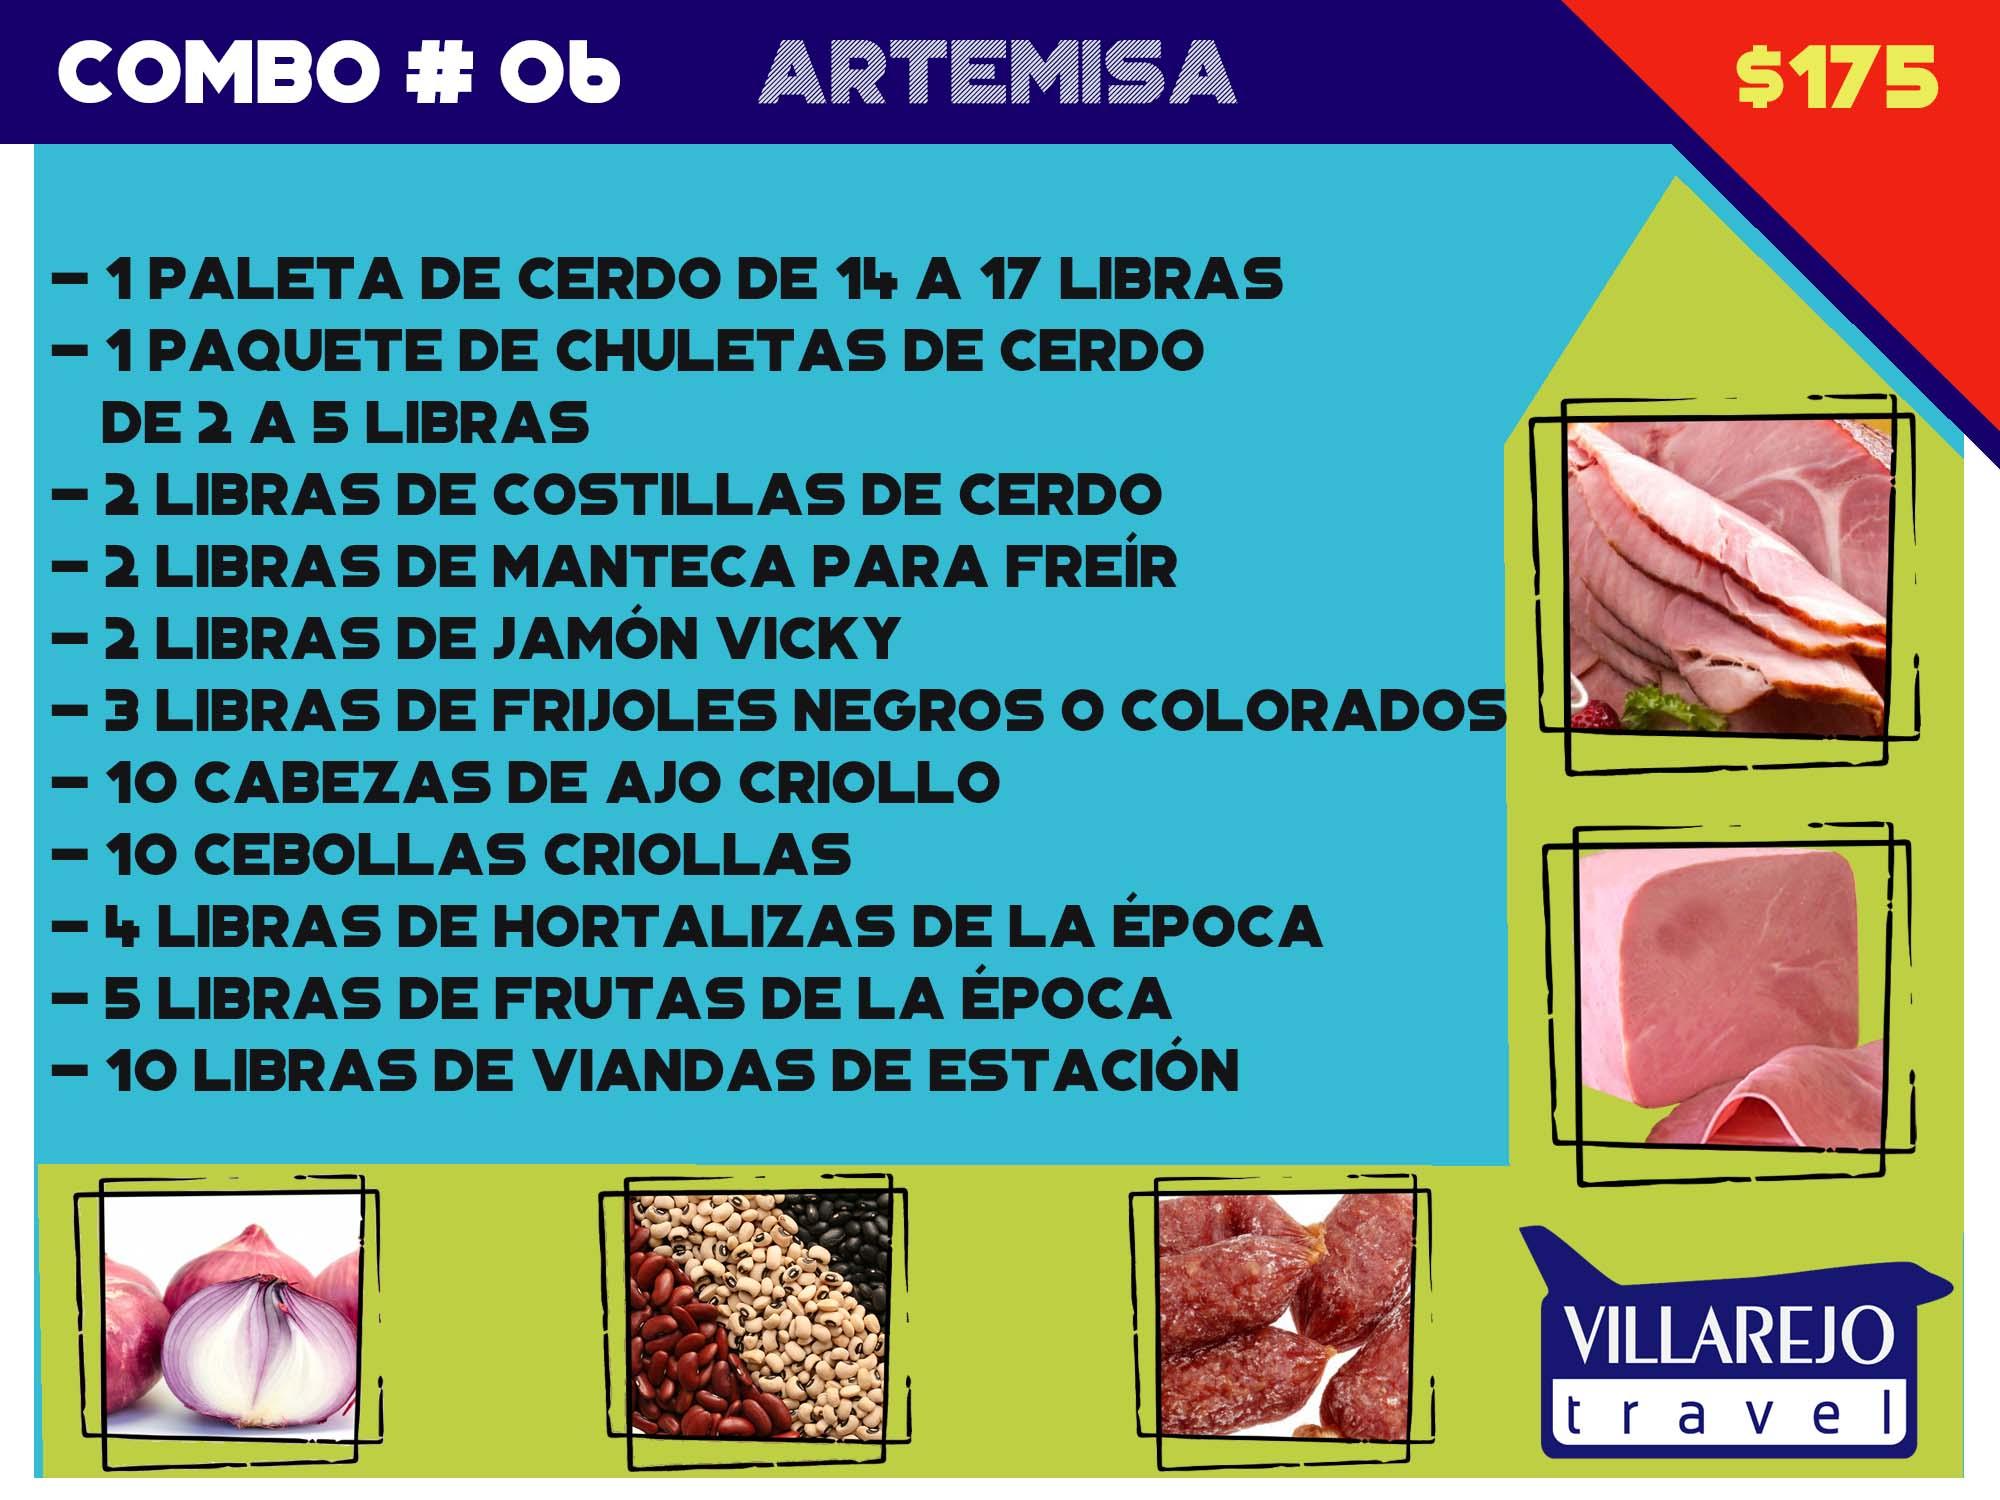 COMBO # 6 PARA LA PROVINCIA DE ARTEMISA  (Paleta)